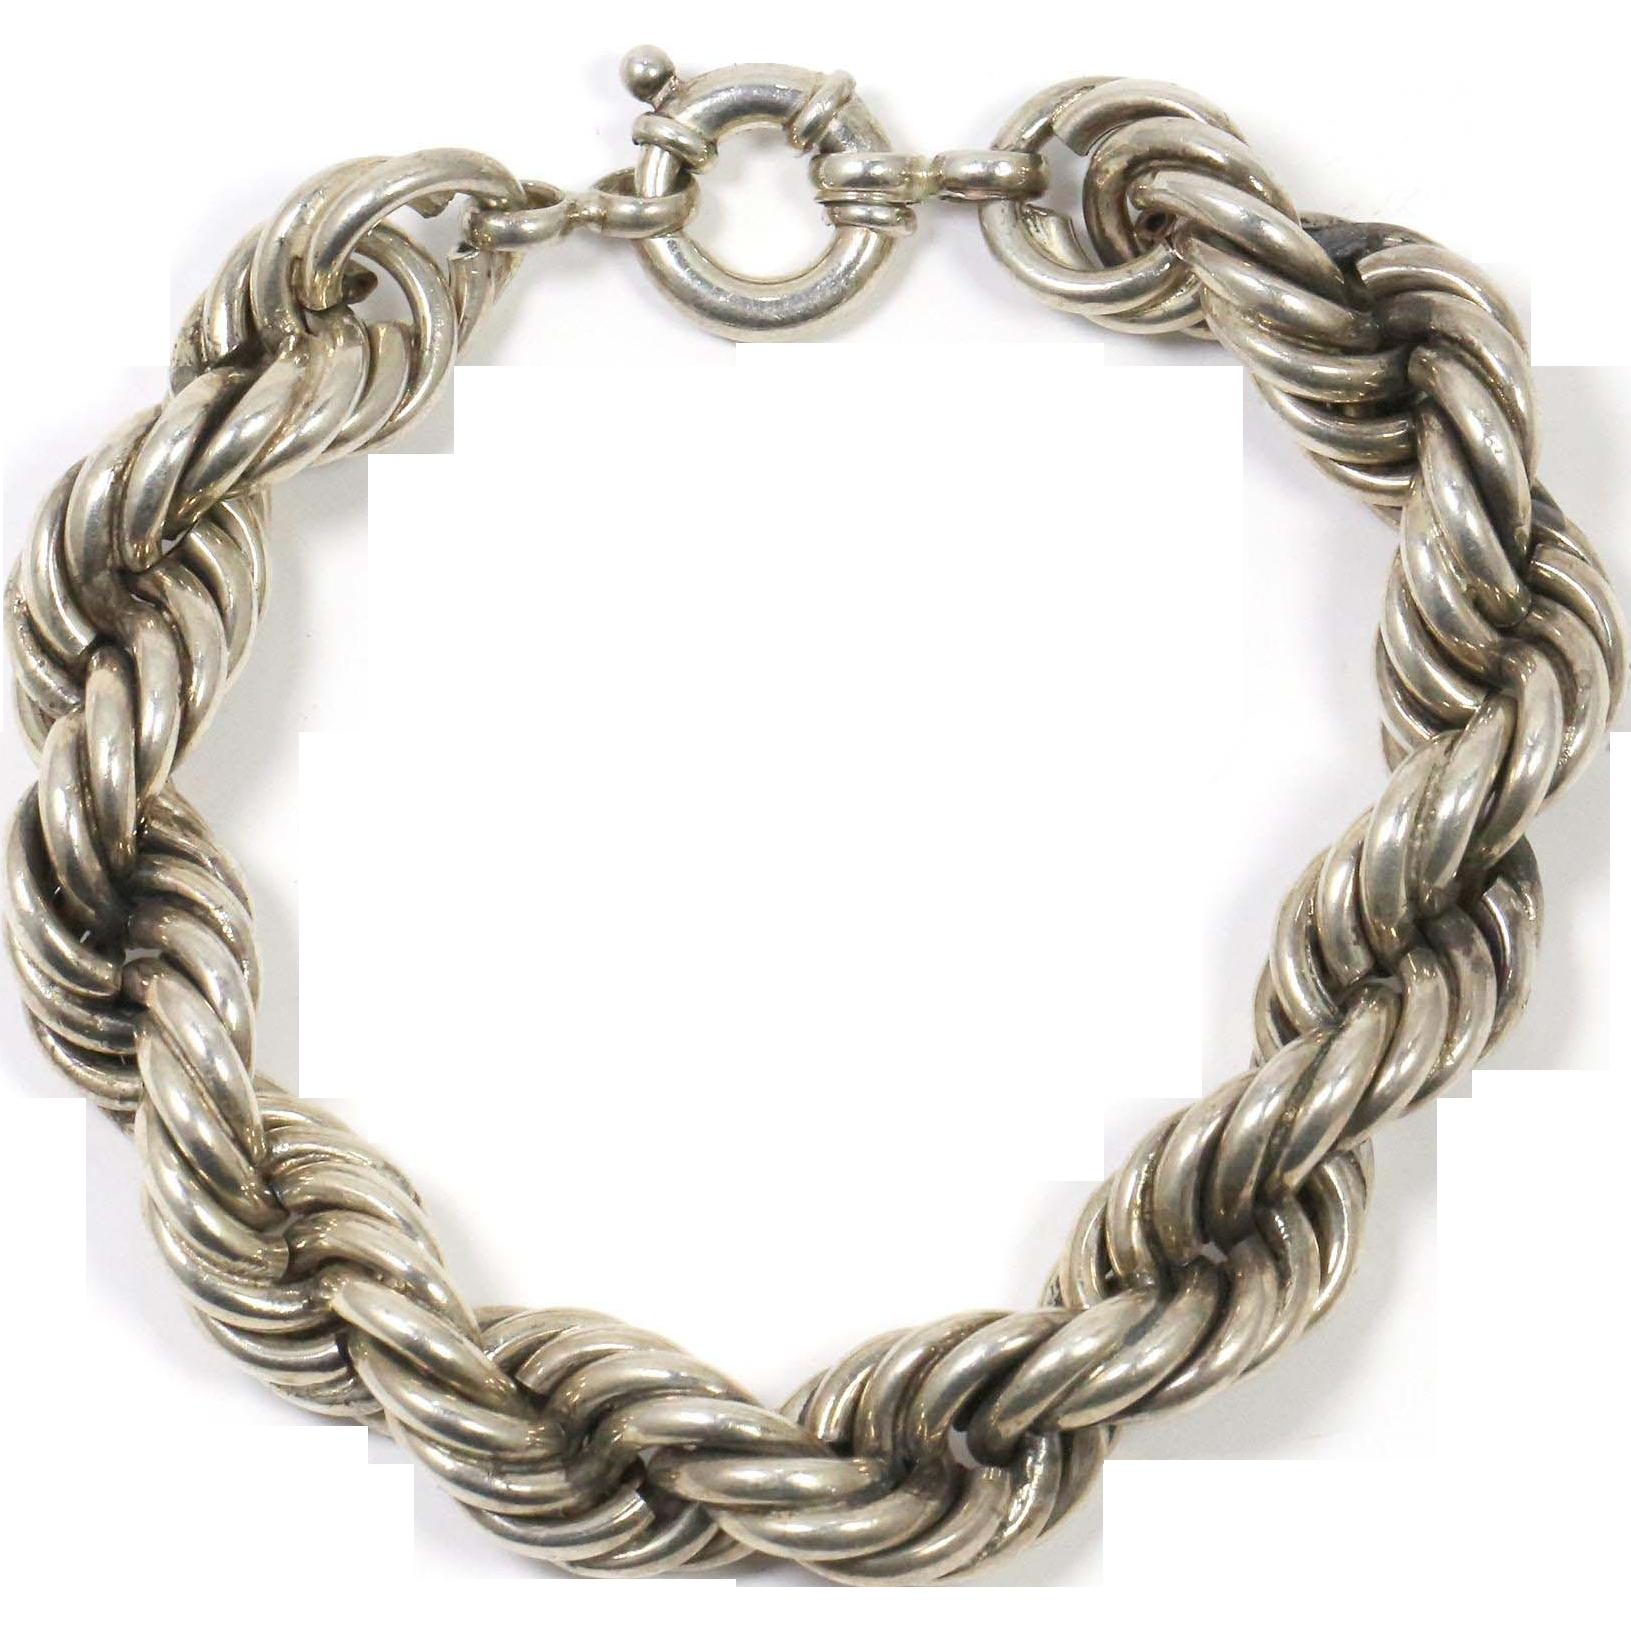 "Silver Rope Bracelet: Vintage Sterling Silver Heavy Rope Bracelet 8"" From The"